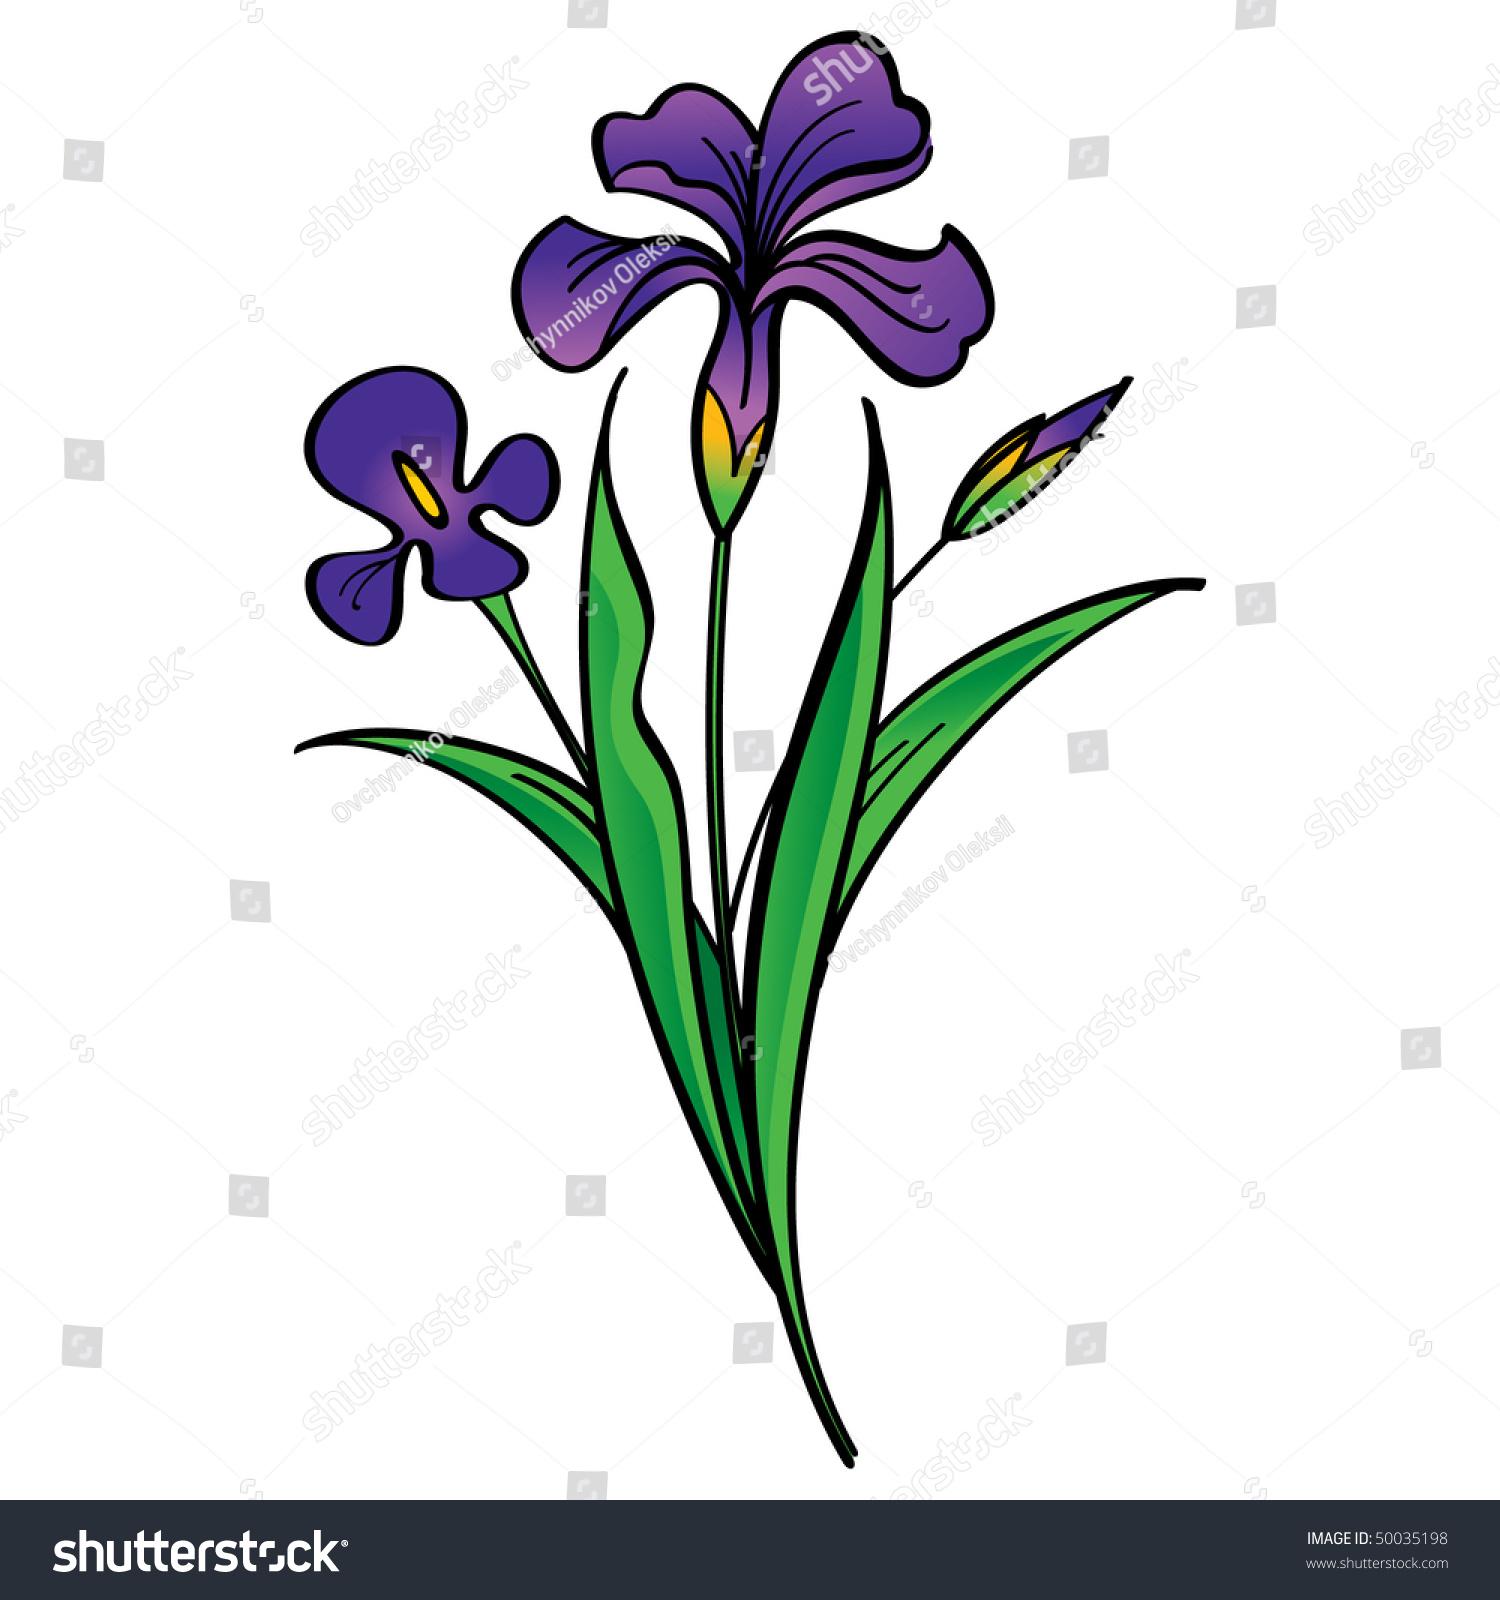 iris beautiful flowers stock vector royalty free 50035198 rh shutterstock com